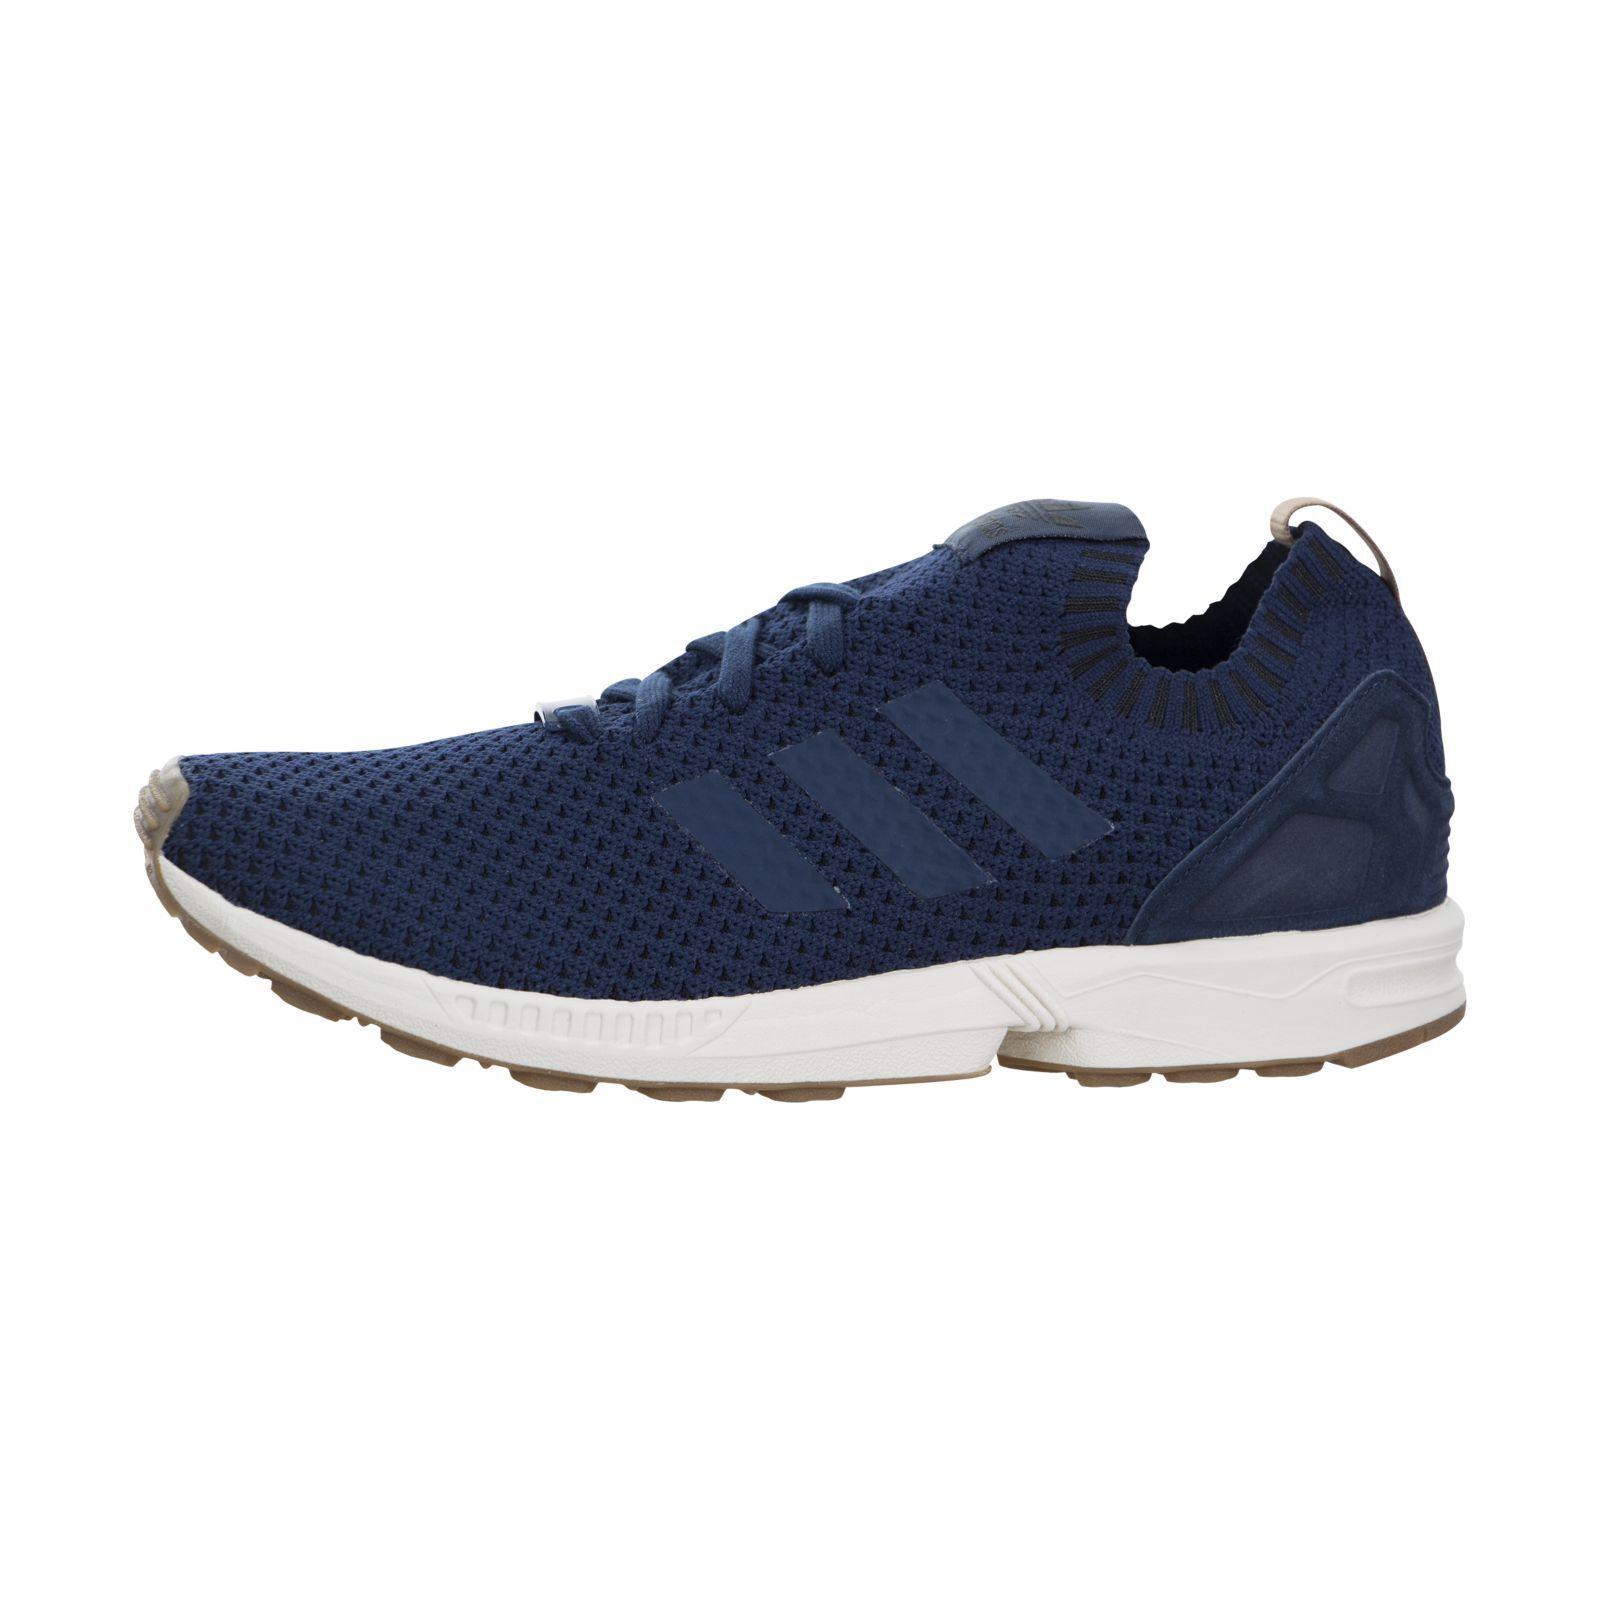 Adidas zx - - flux - zx primeknit 6590c1